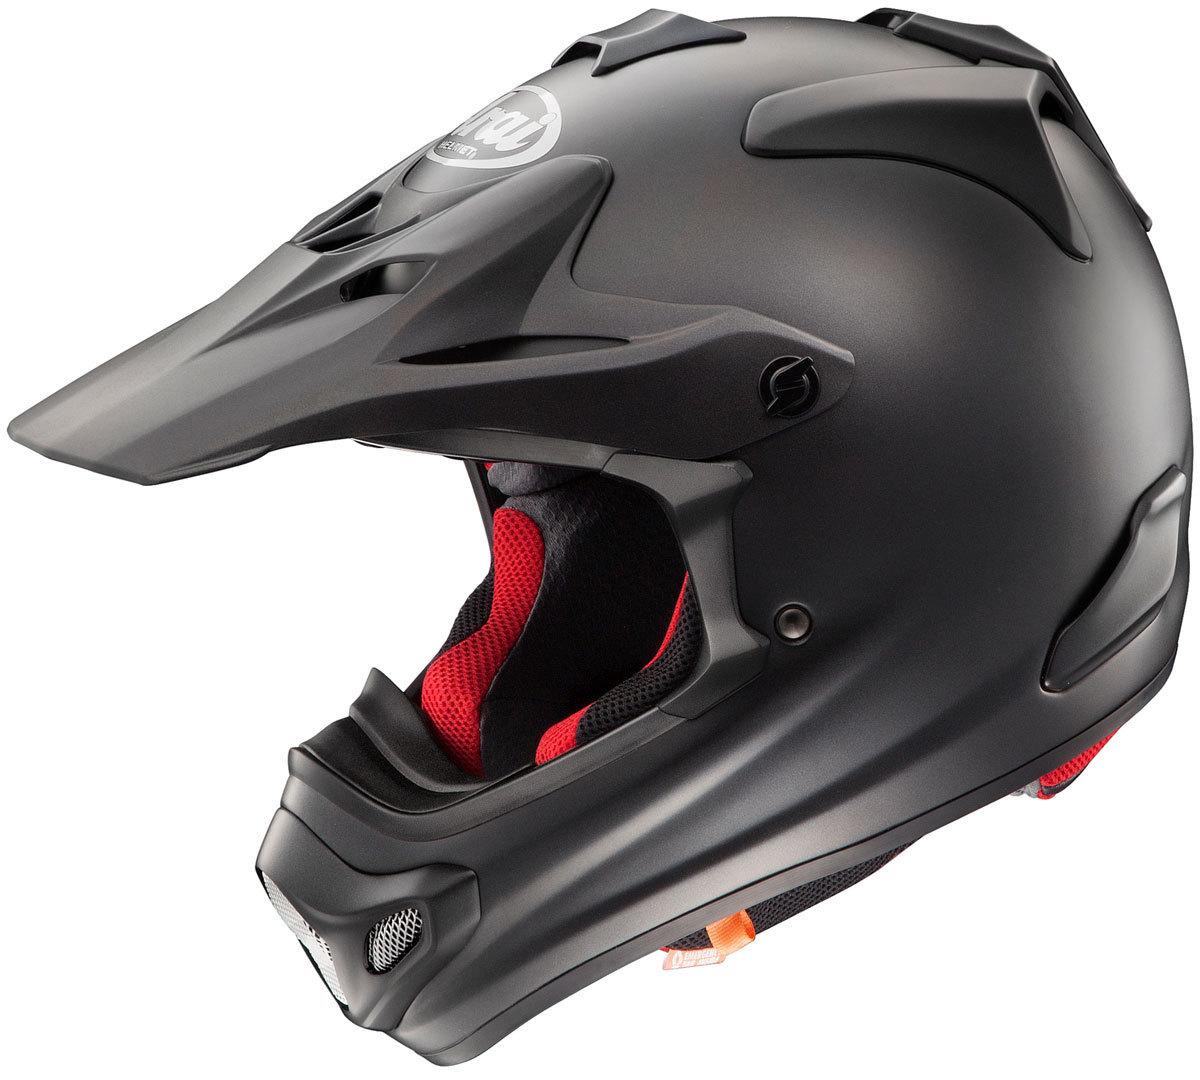 Arai MX-V Solid Frost Motocross Helm, schwarz, Größe XS, schwarz, Größe XS